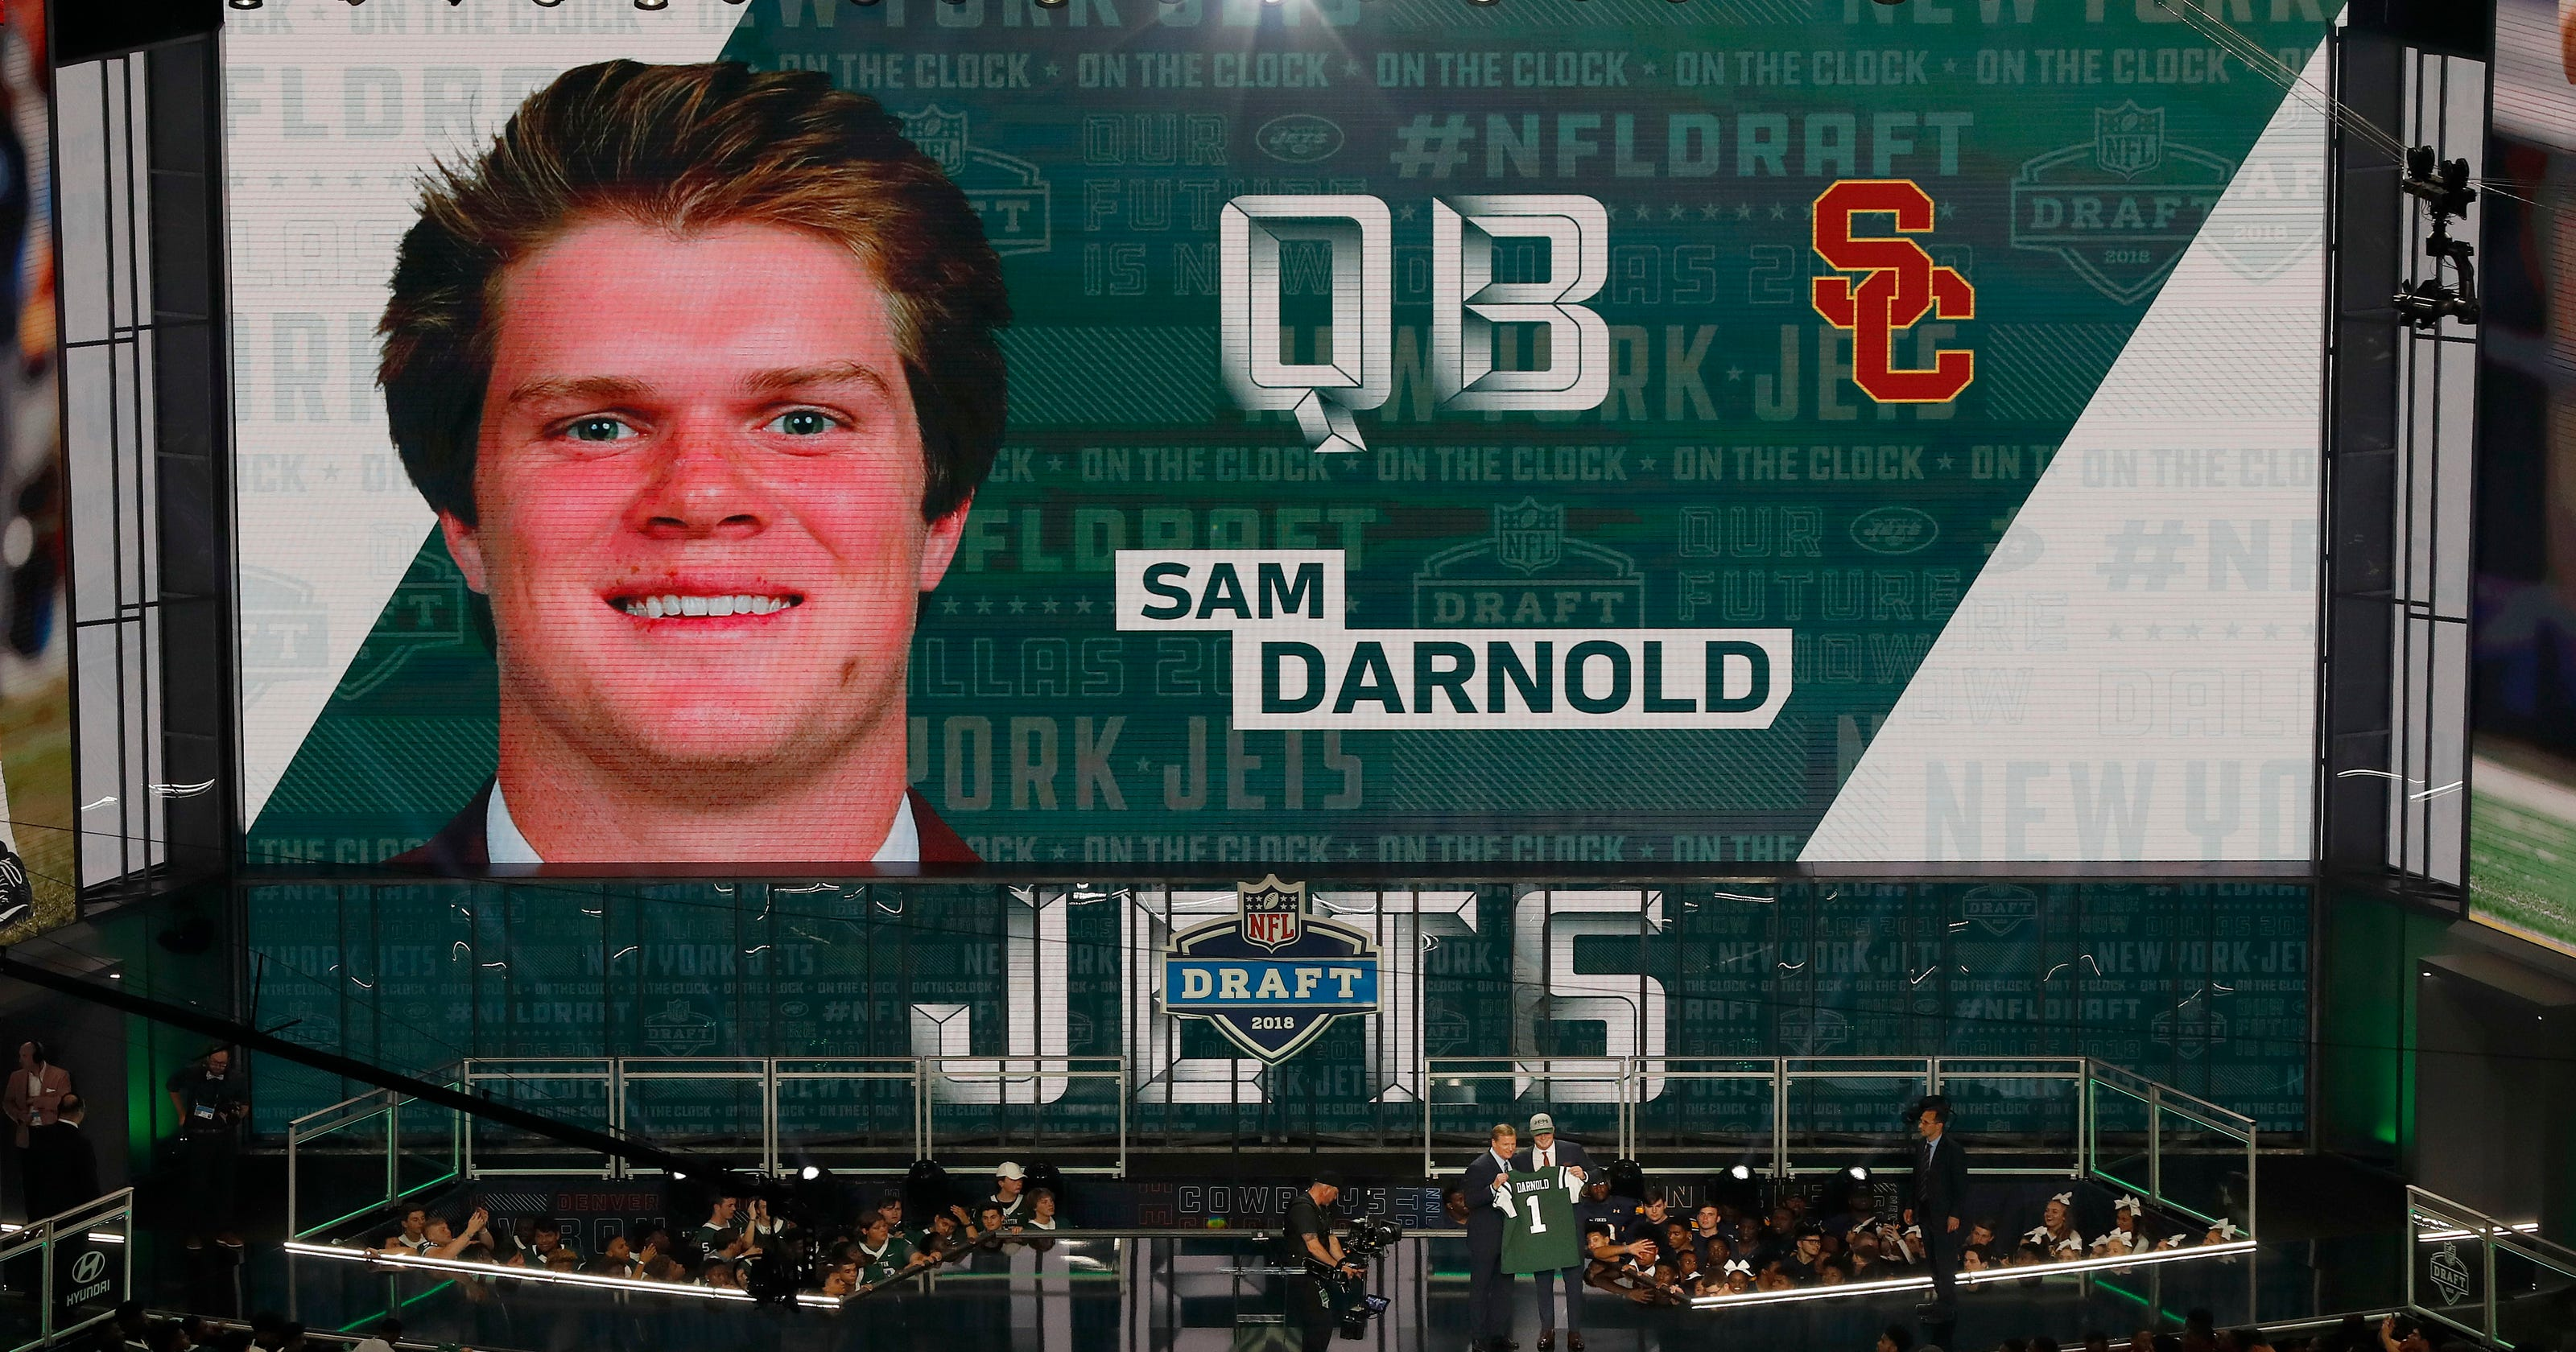 225f95f6e38 Jets draft USC quarterback Sam Darnold with No. 3 pick